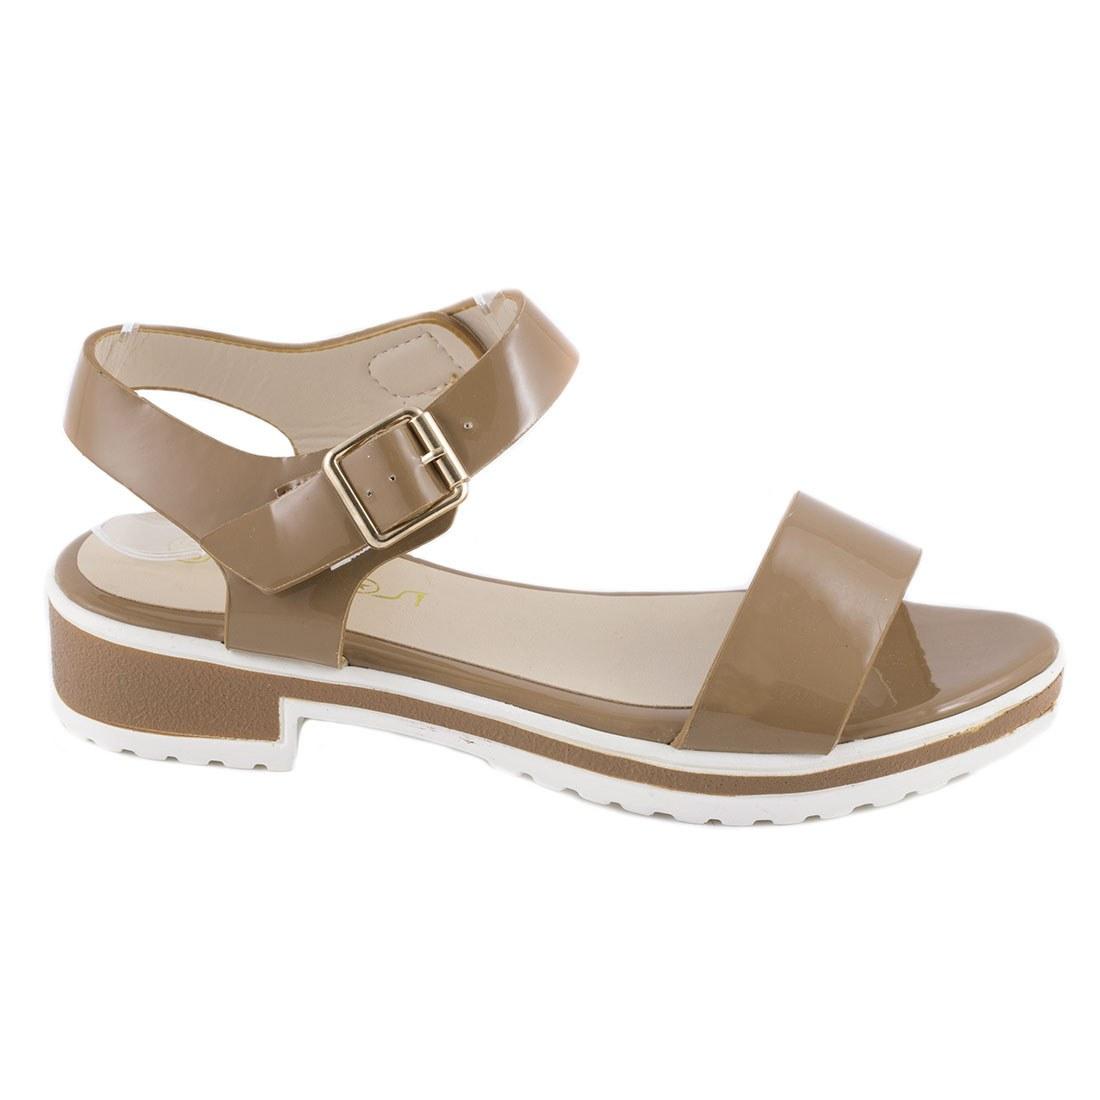 Sandale dama usoare JW-4672-KAKI